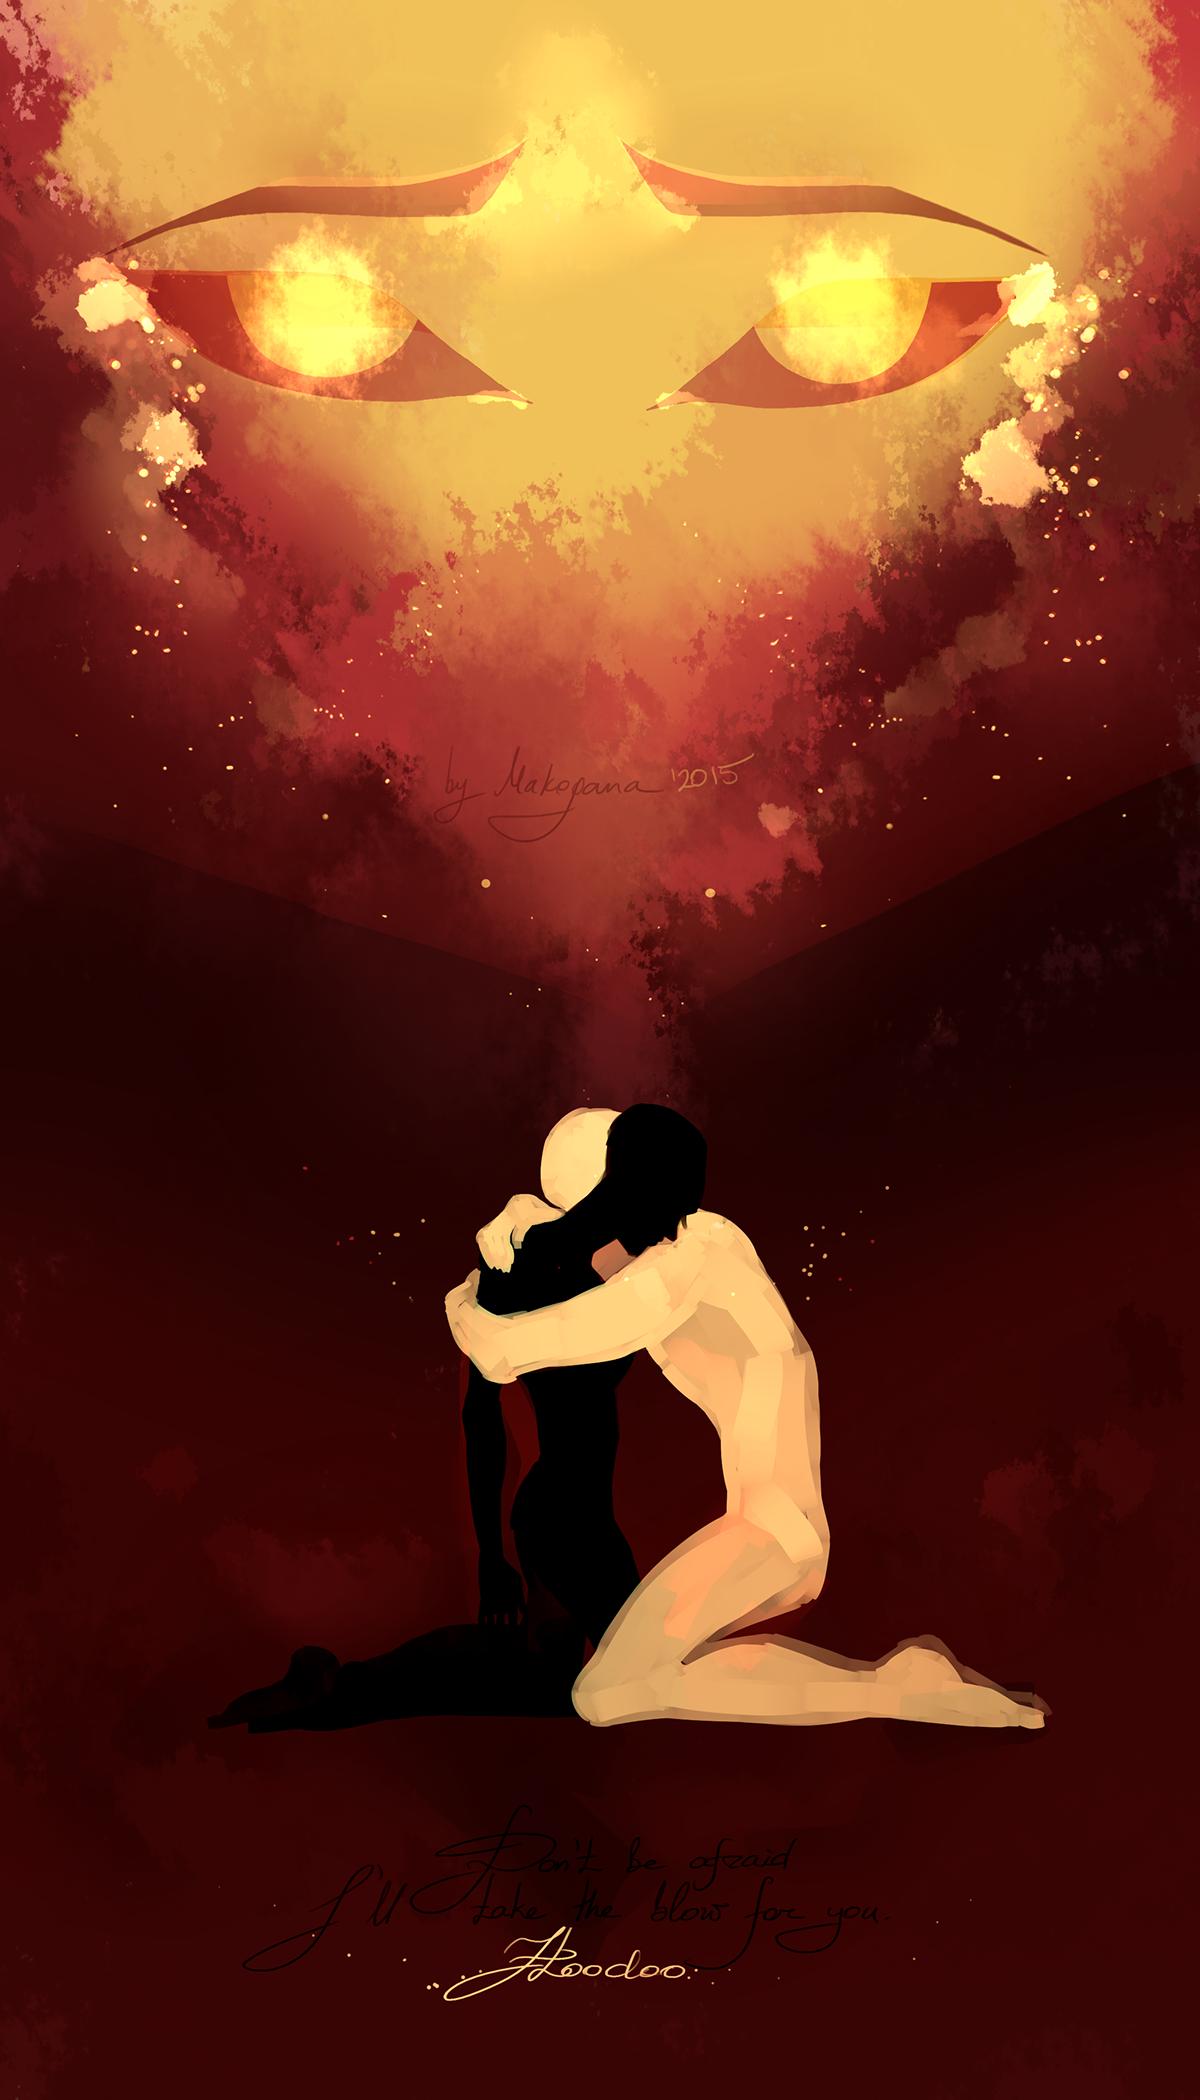 black holes and revelations artwork - photo #23